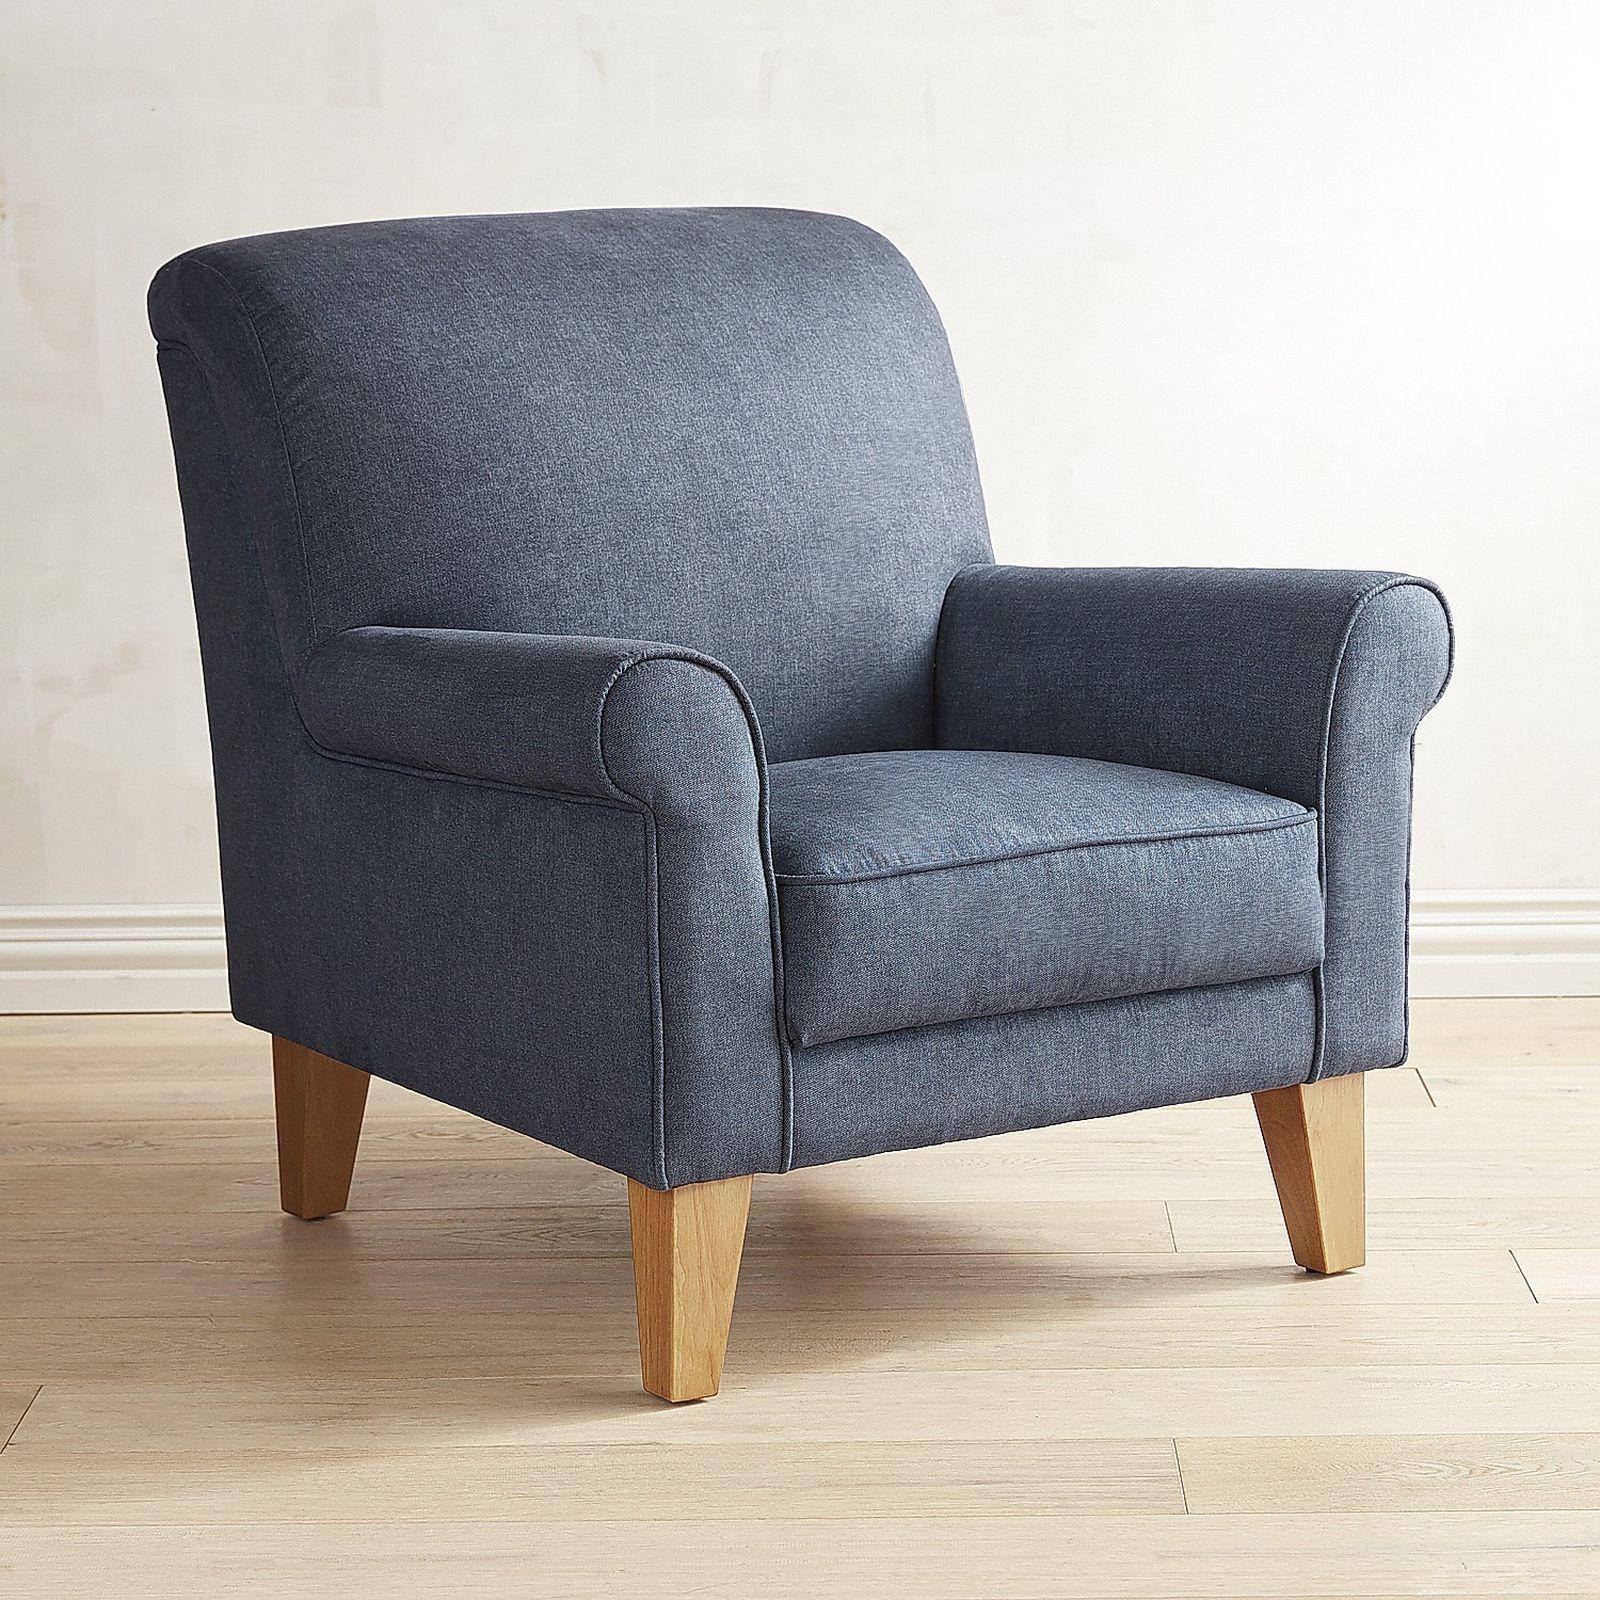 Merveilleux Lyndee Denim Blue Rolled Armchair